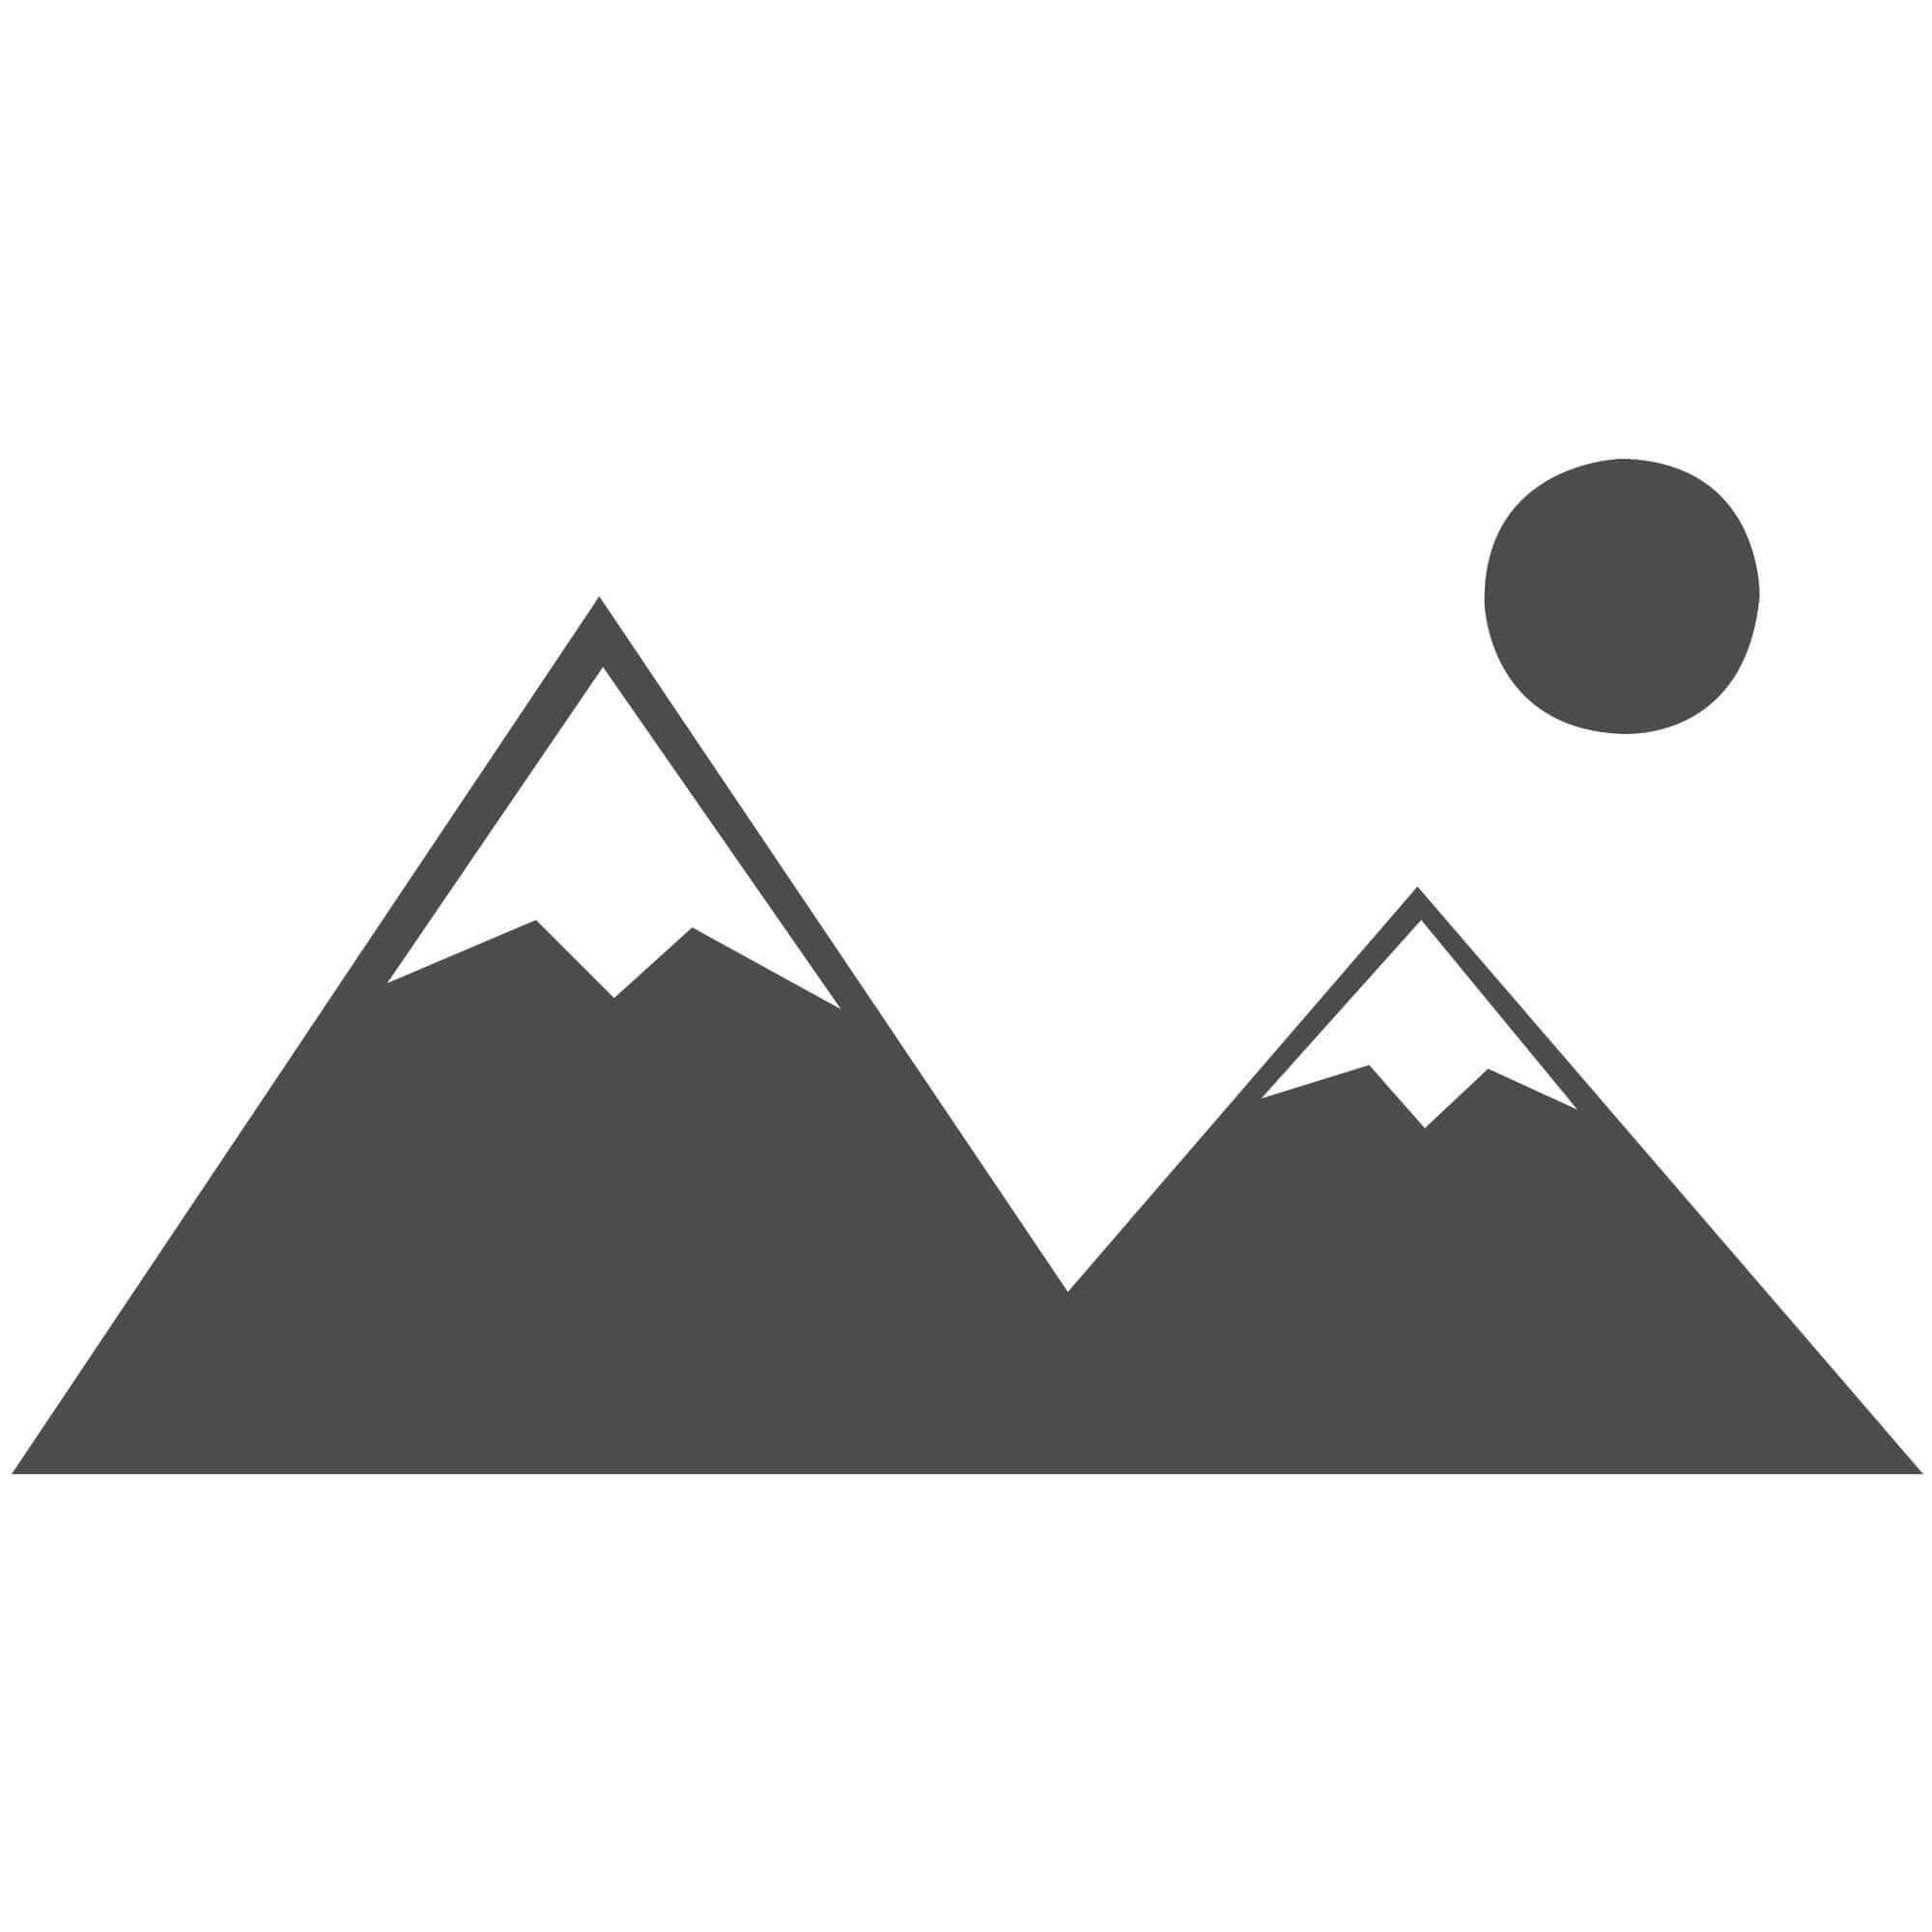 Stovax 4049 black & brass scuttle #FPW